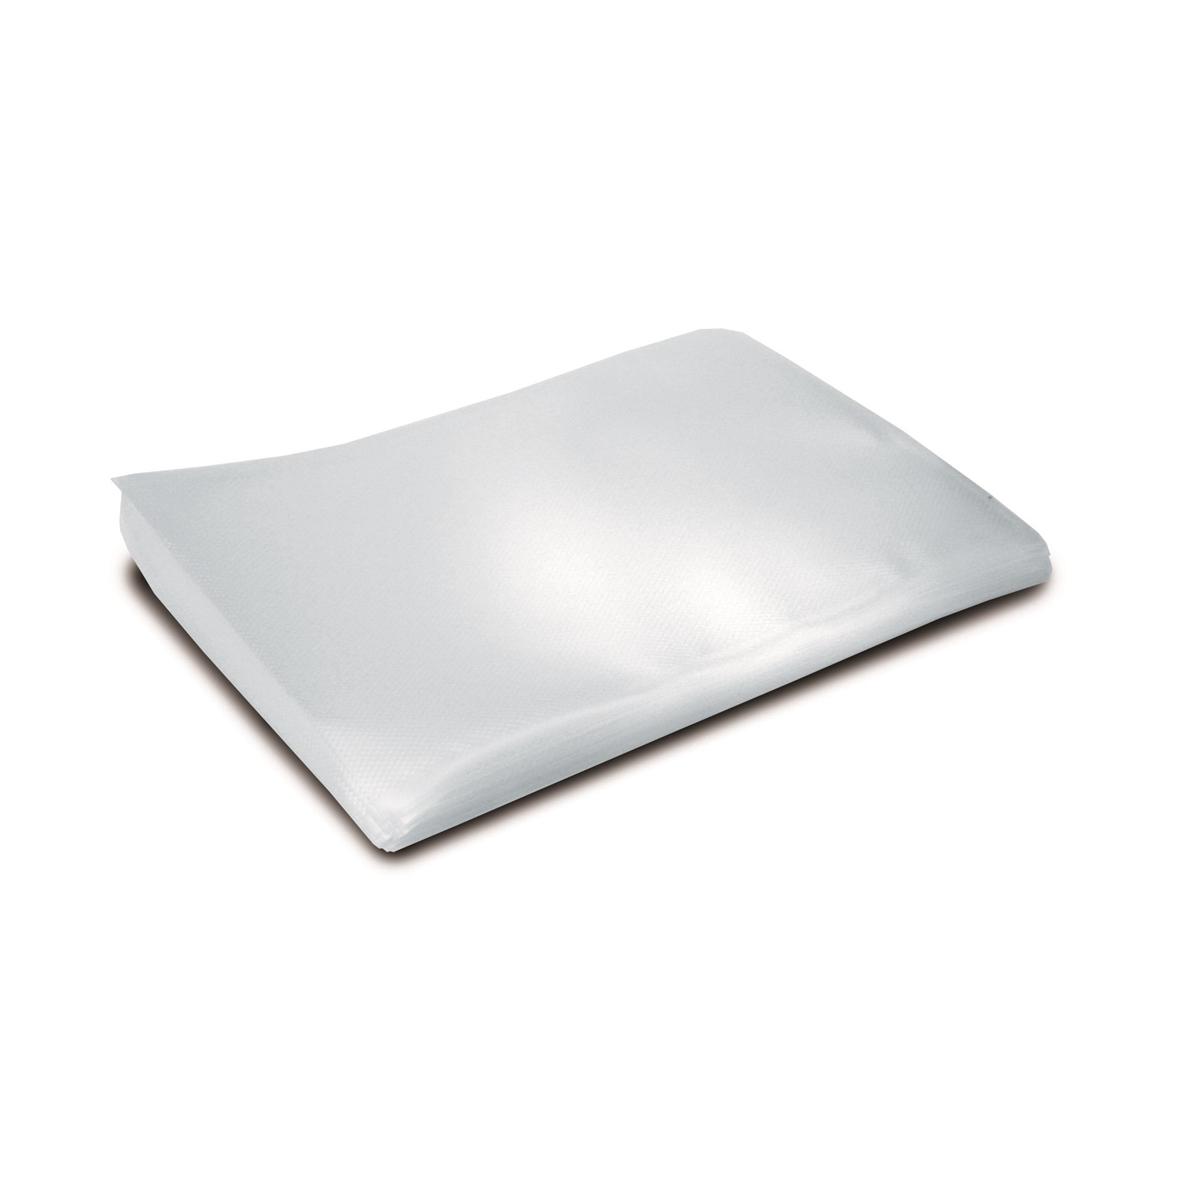 Bags 40x60cm, 25 pcs